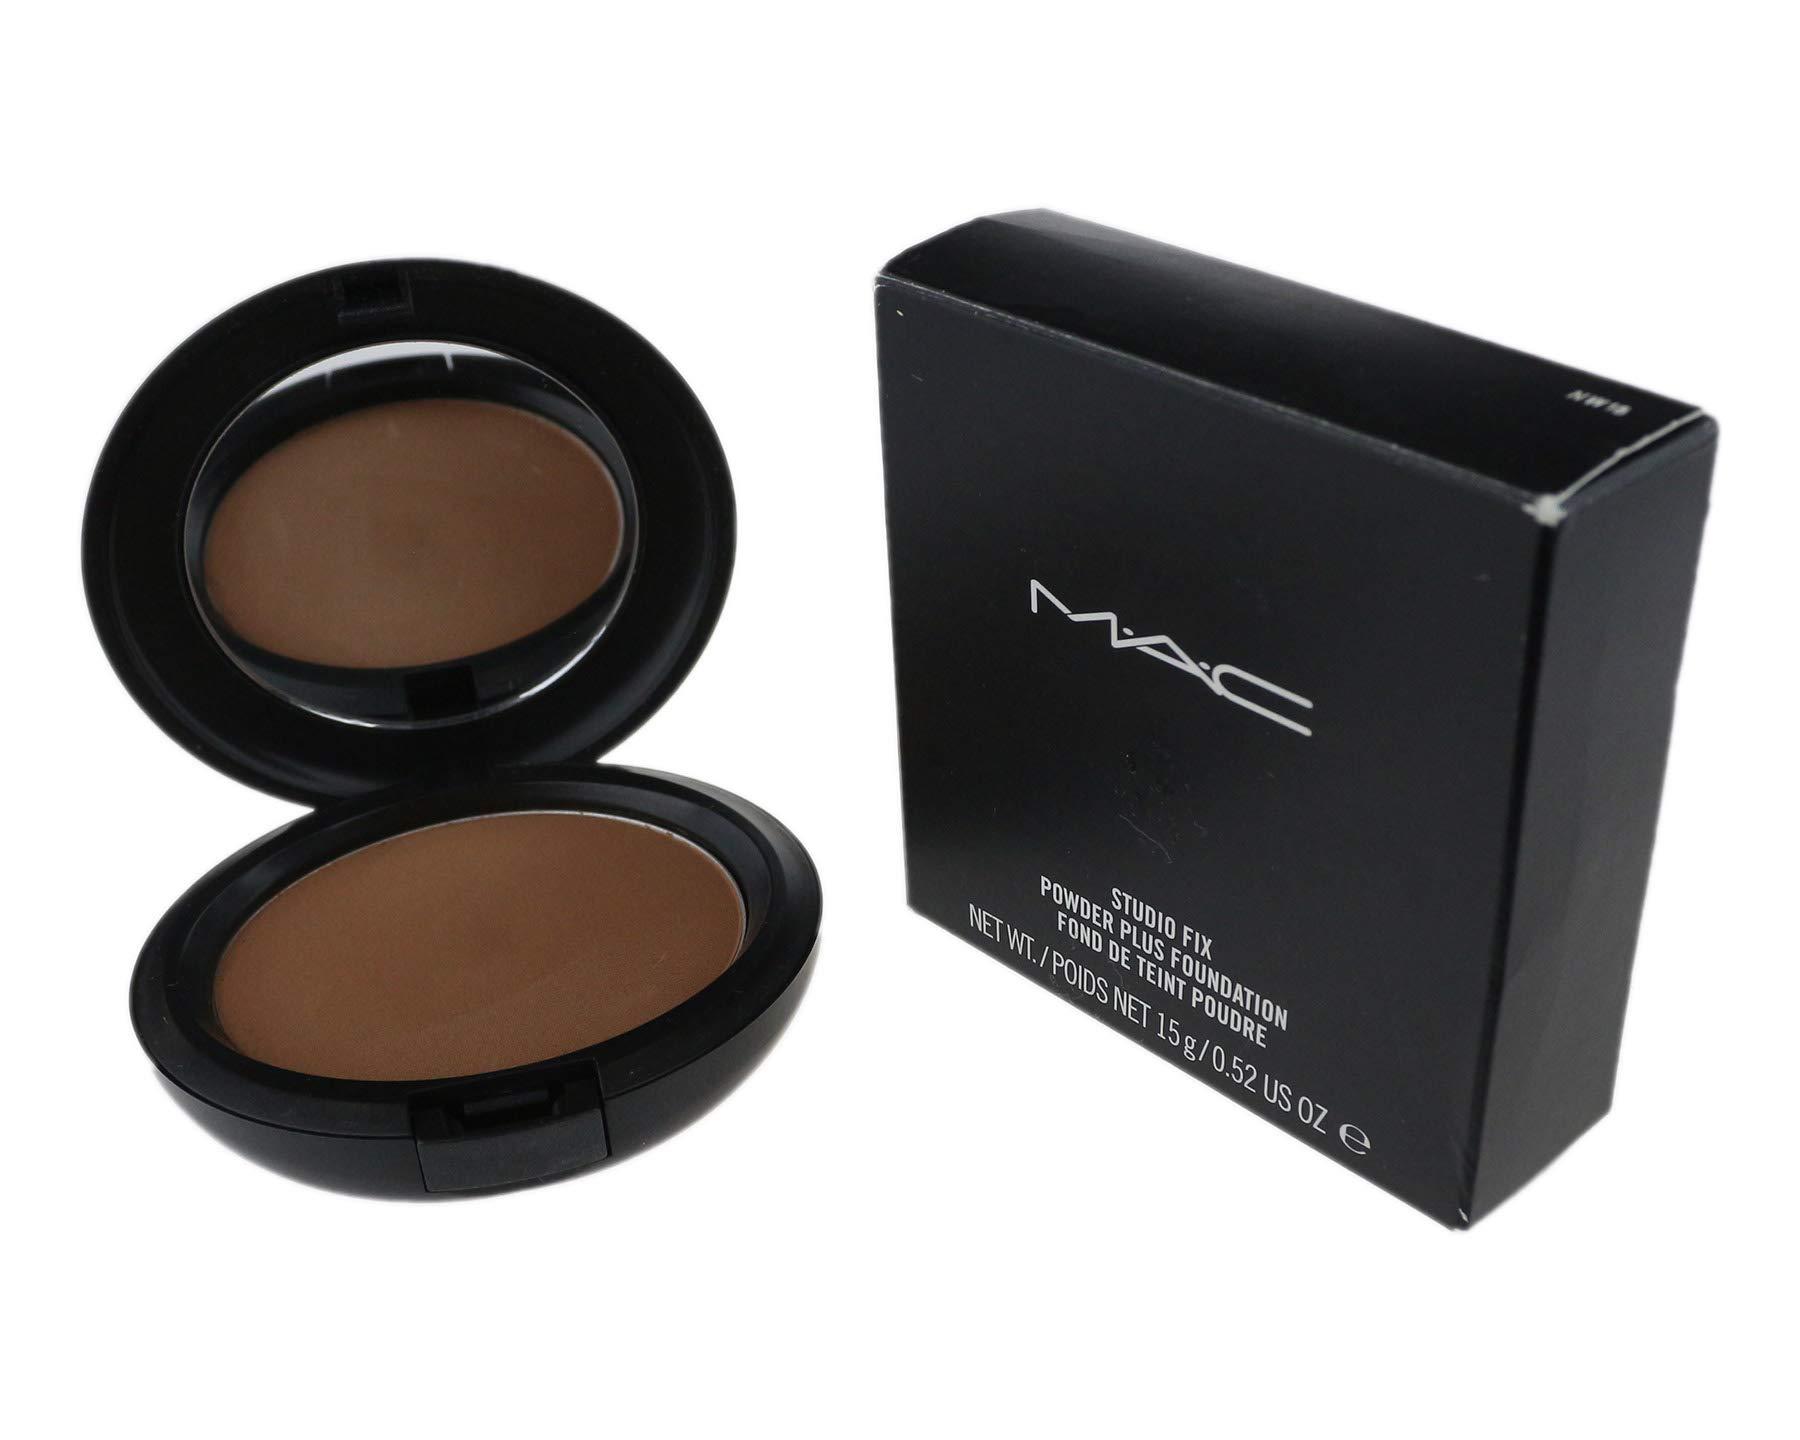 Mac Studio Fix Powder Plus Foundation Nc20 For Women Maybelline Two Cake Bedak 2 Pcs 052 Ounce Makeup Beauty